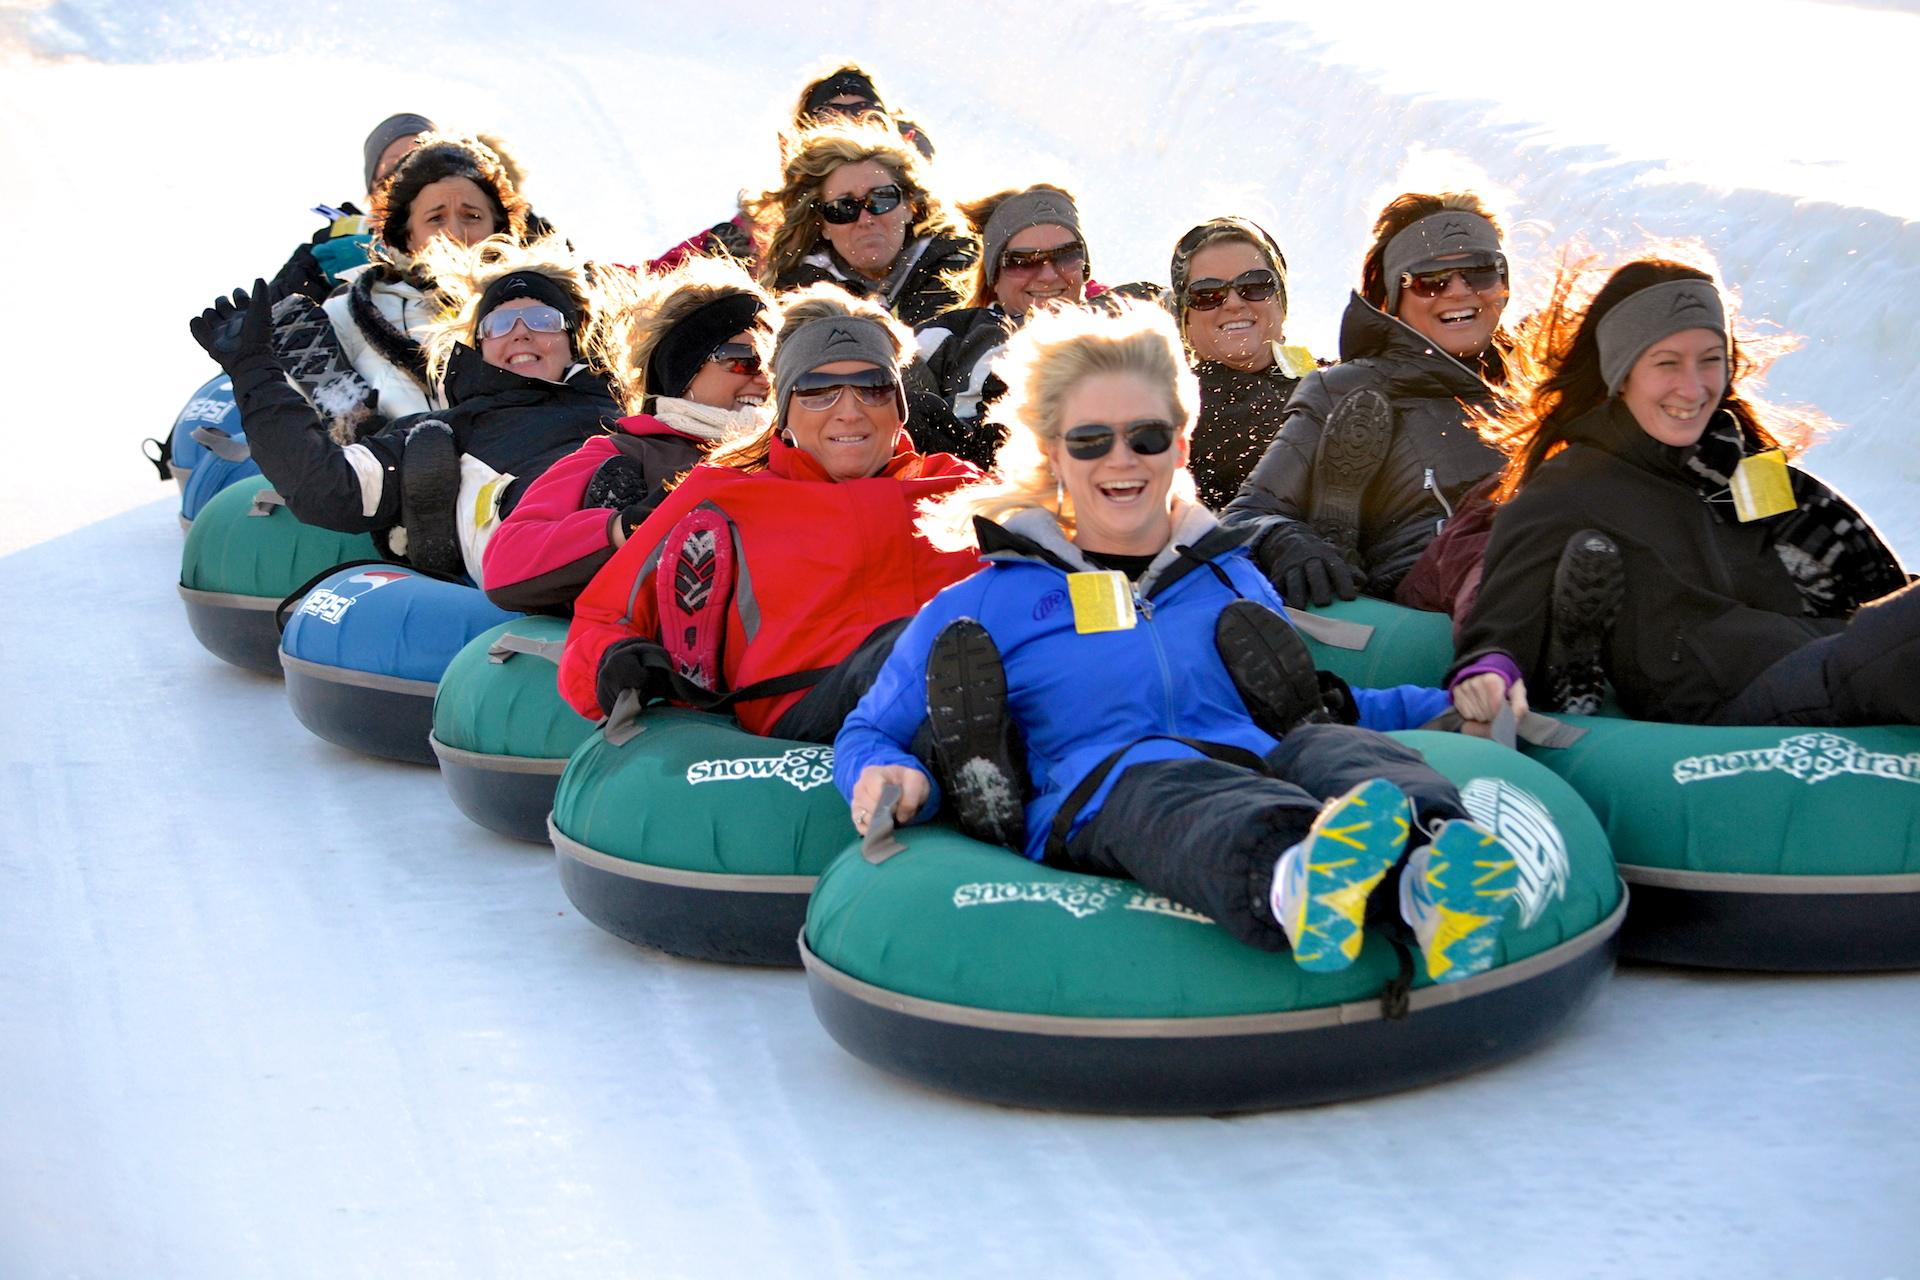 Activities-Snow-Tubing_kids-up-close1-300x2001.jpg